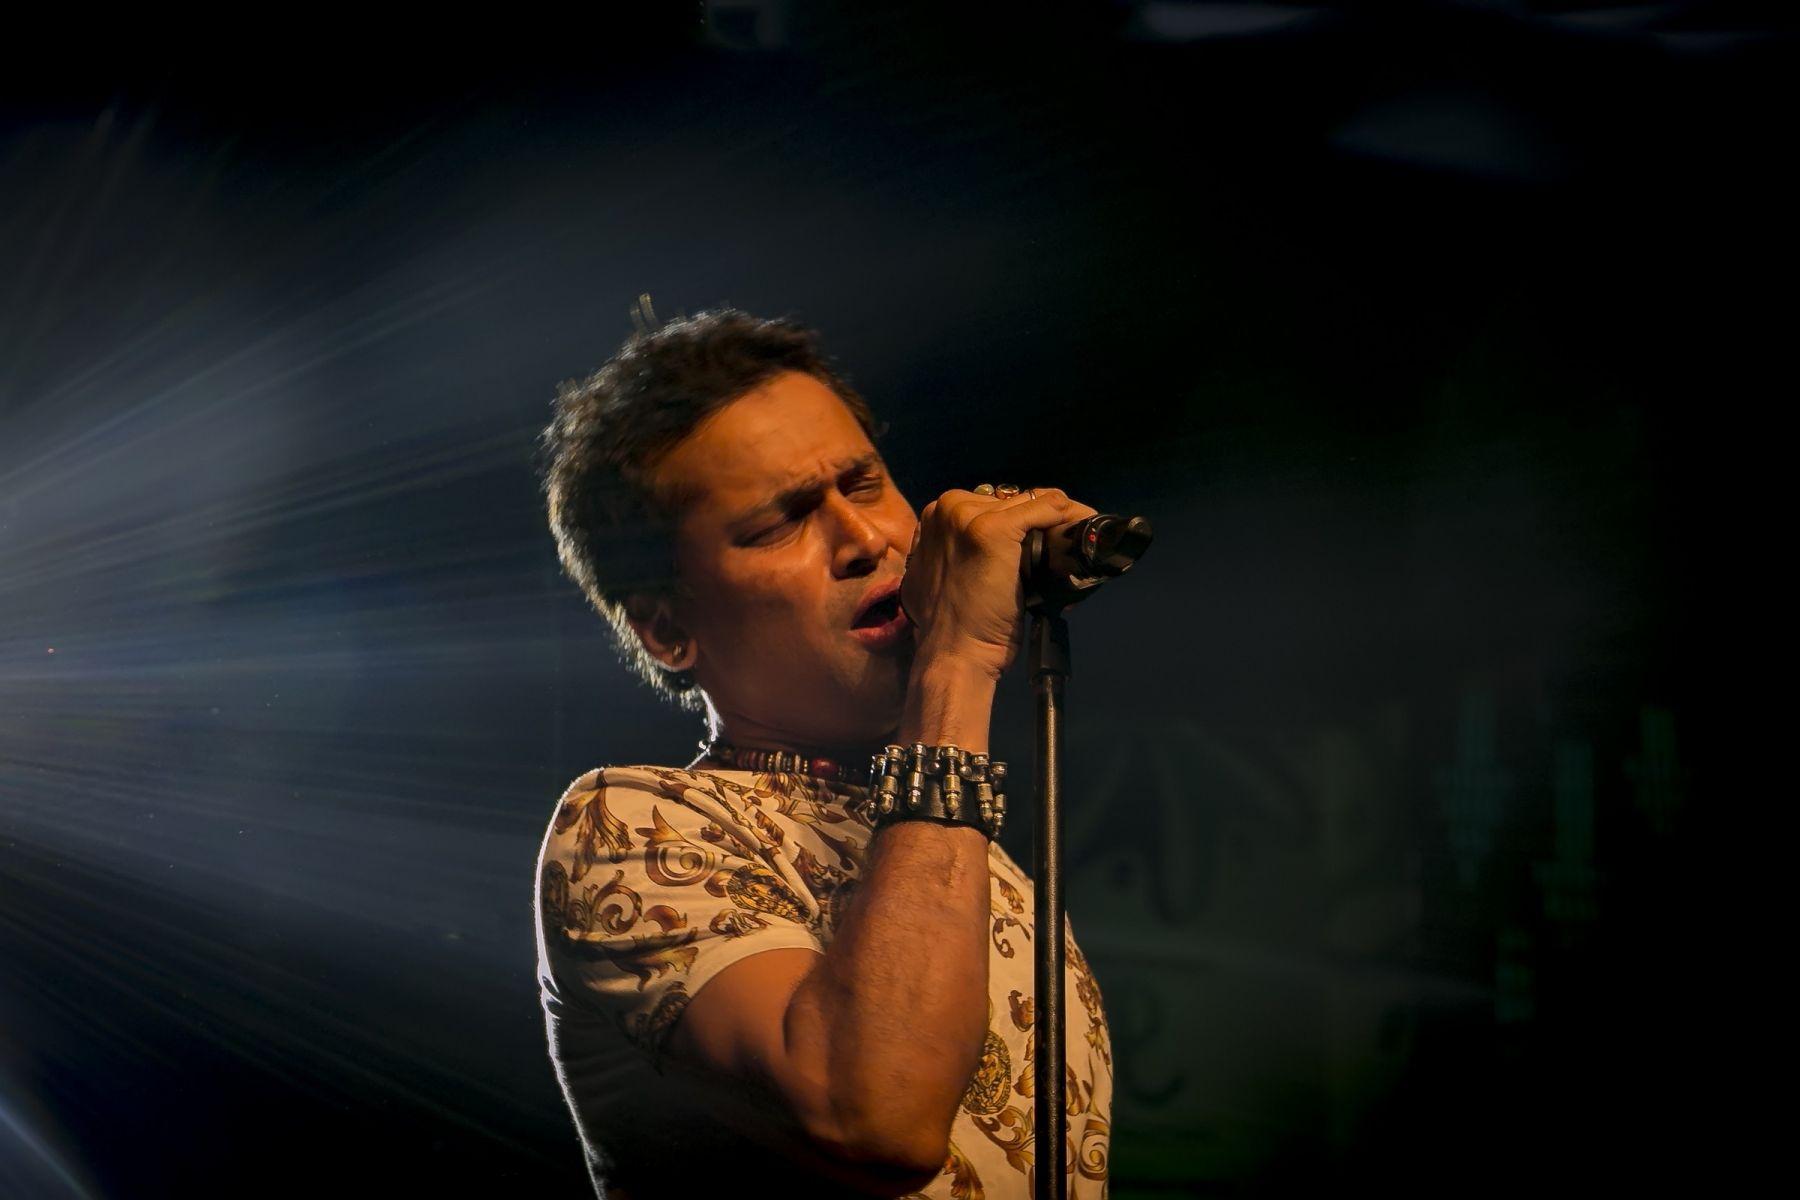 Anaya Brahma performing at North East Festival